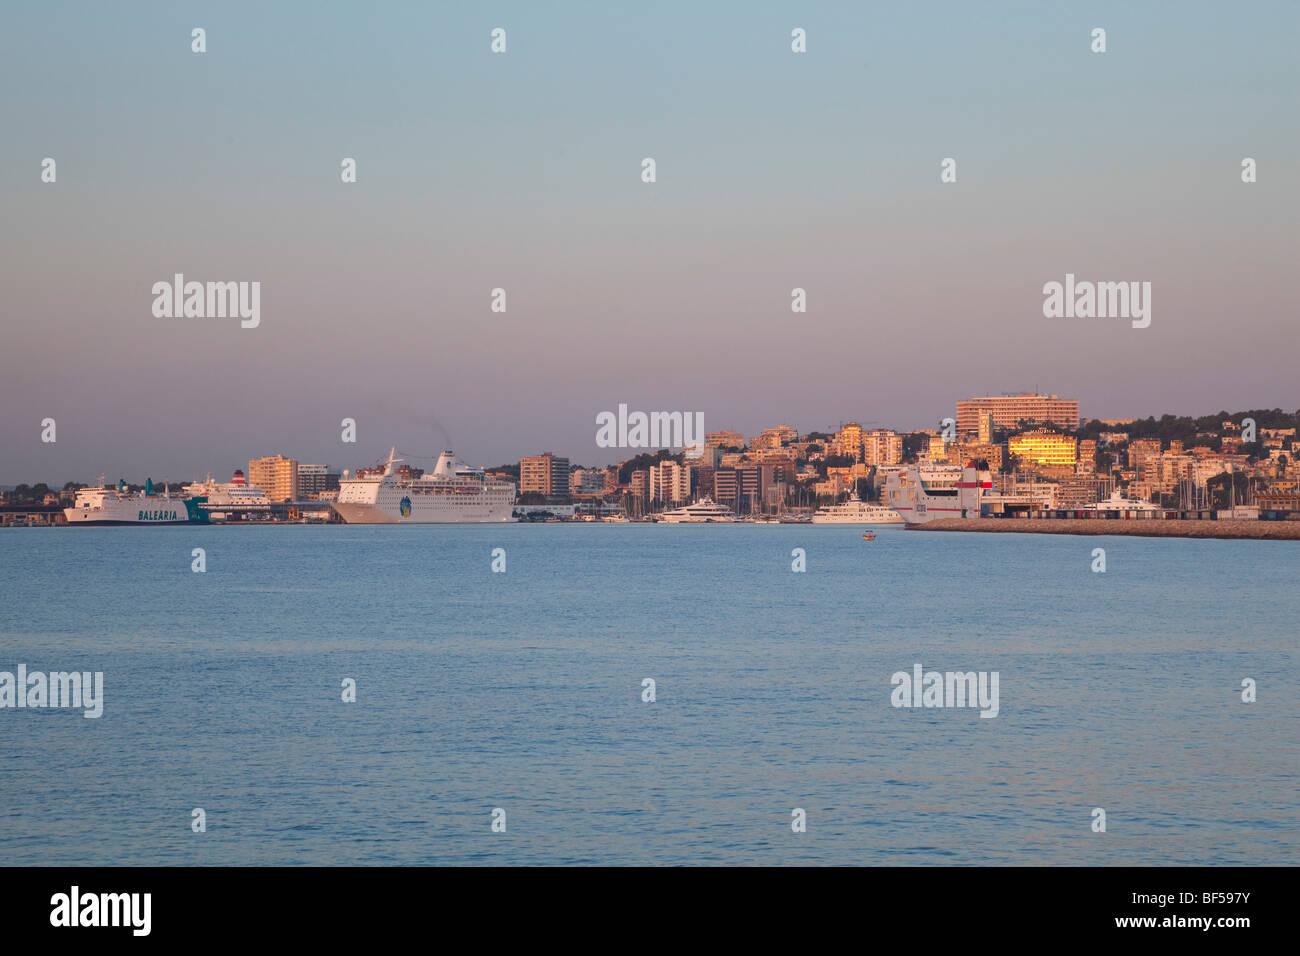 Skyline of Palma de Mallorca in the morning sun, Mallorca, Majorca, Balearic Islands, Mediterranean Sea, Spain, - Stock Image